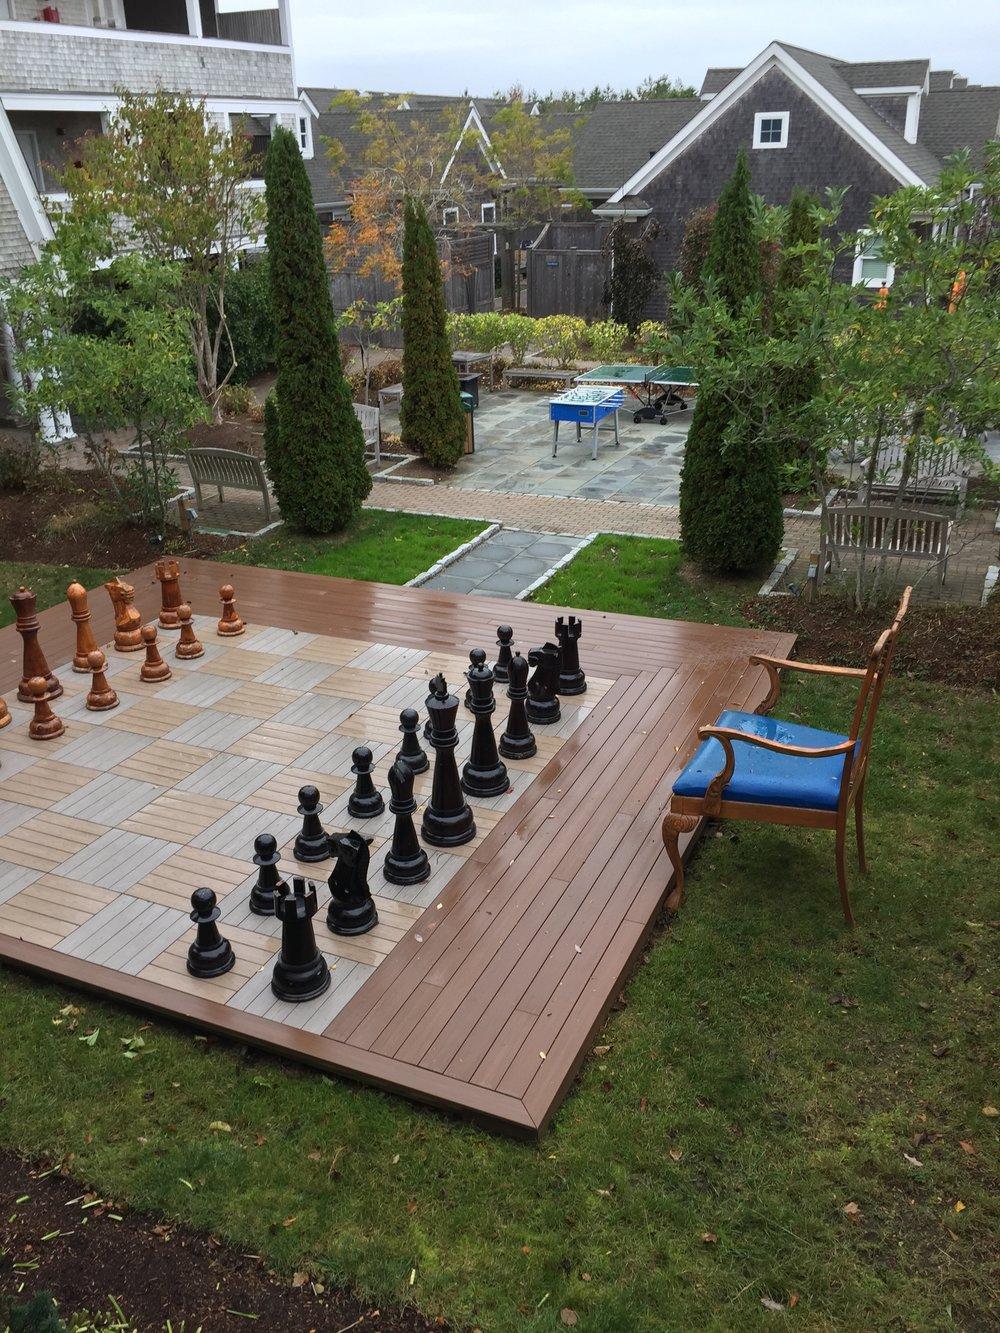 Chess set Winnetu Martha's Vineyard .jpg